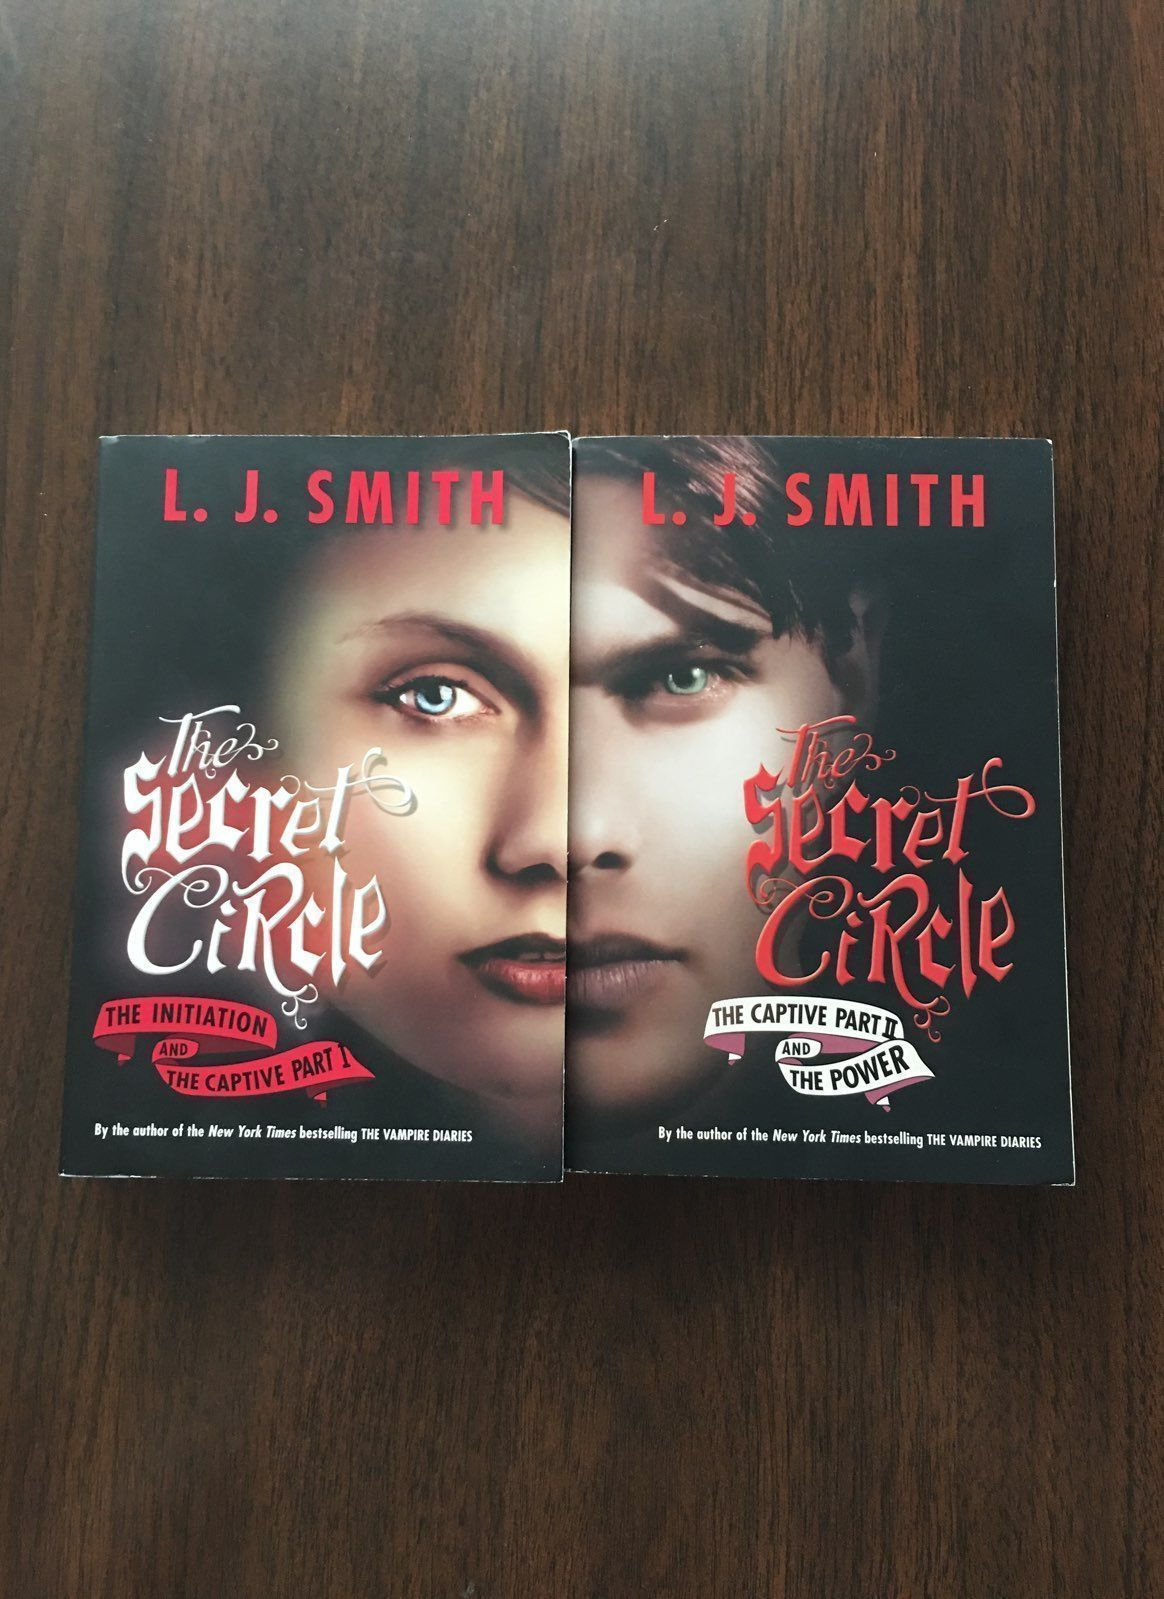 25+ Lj smith books the secret circle info